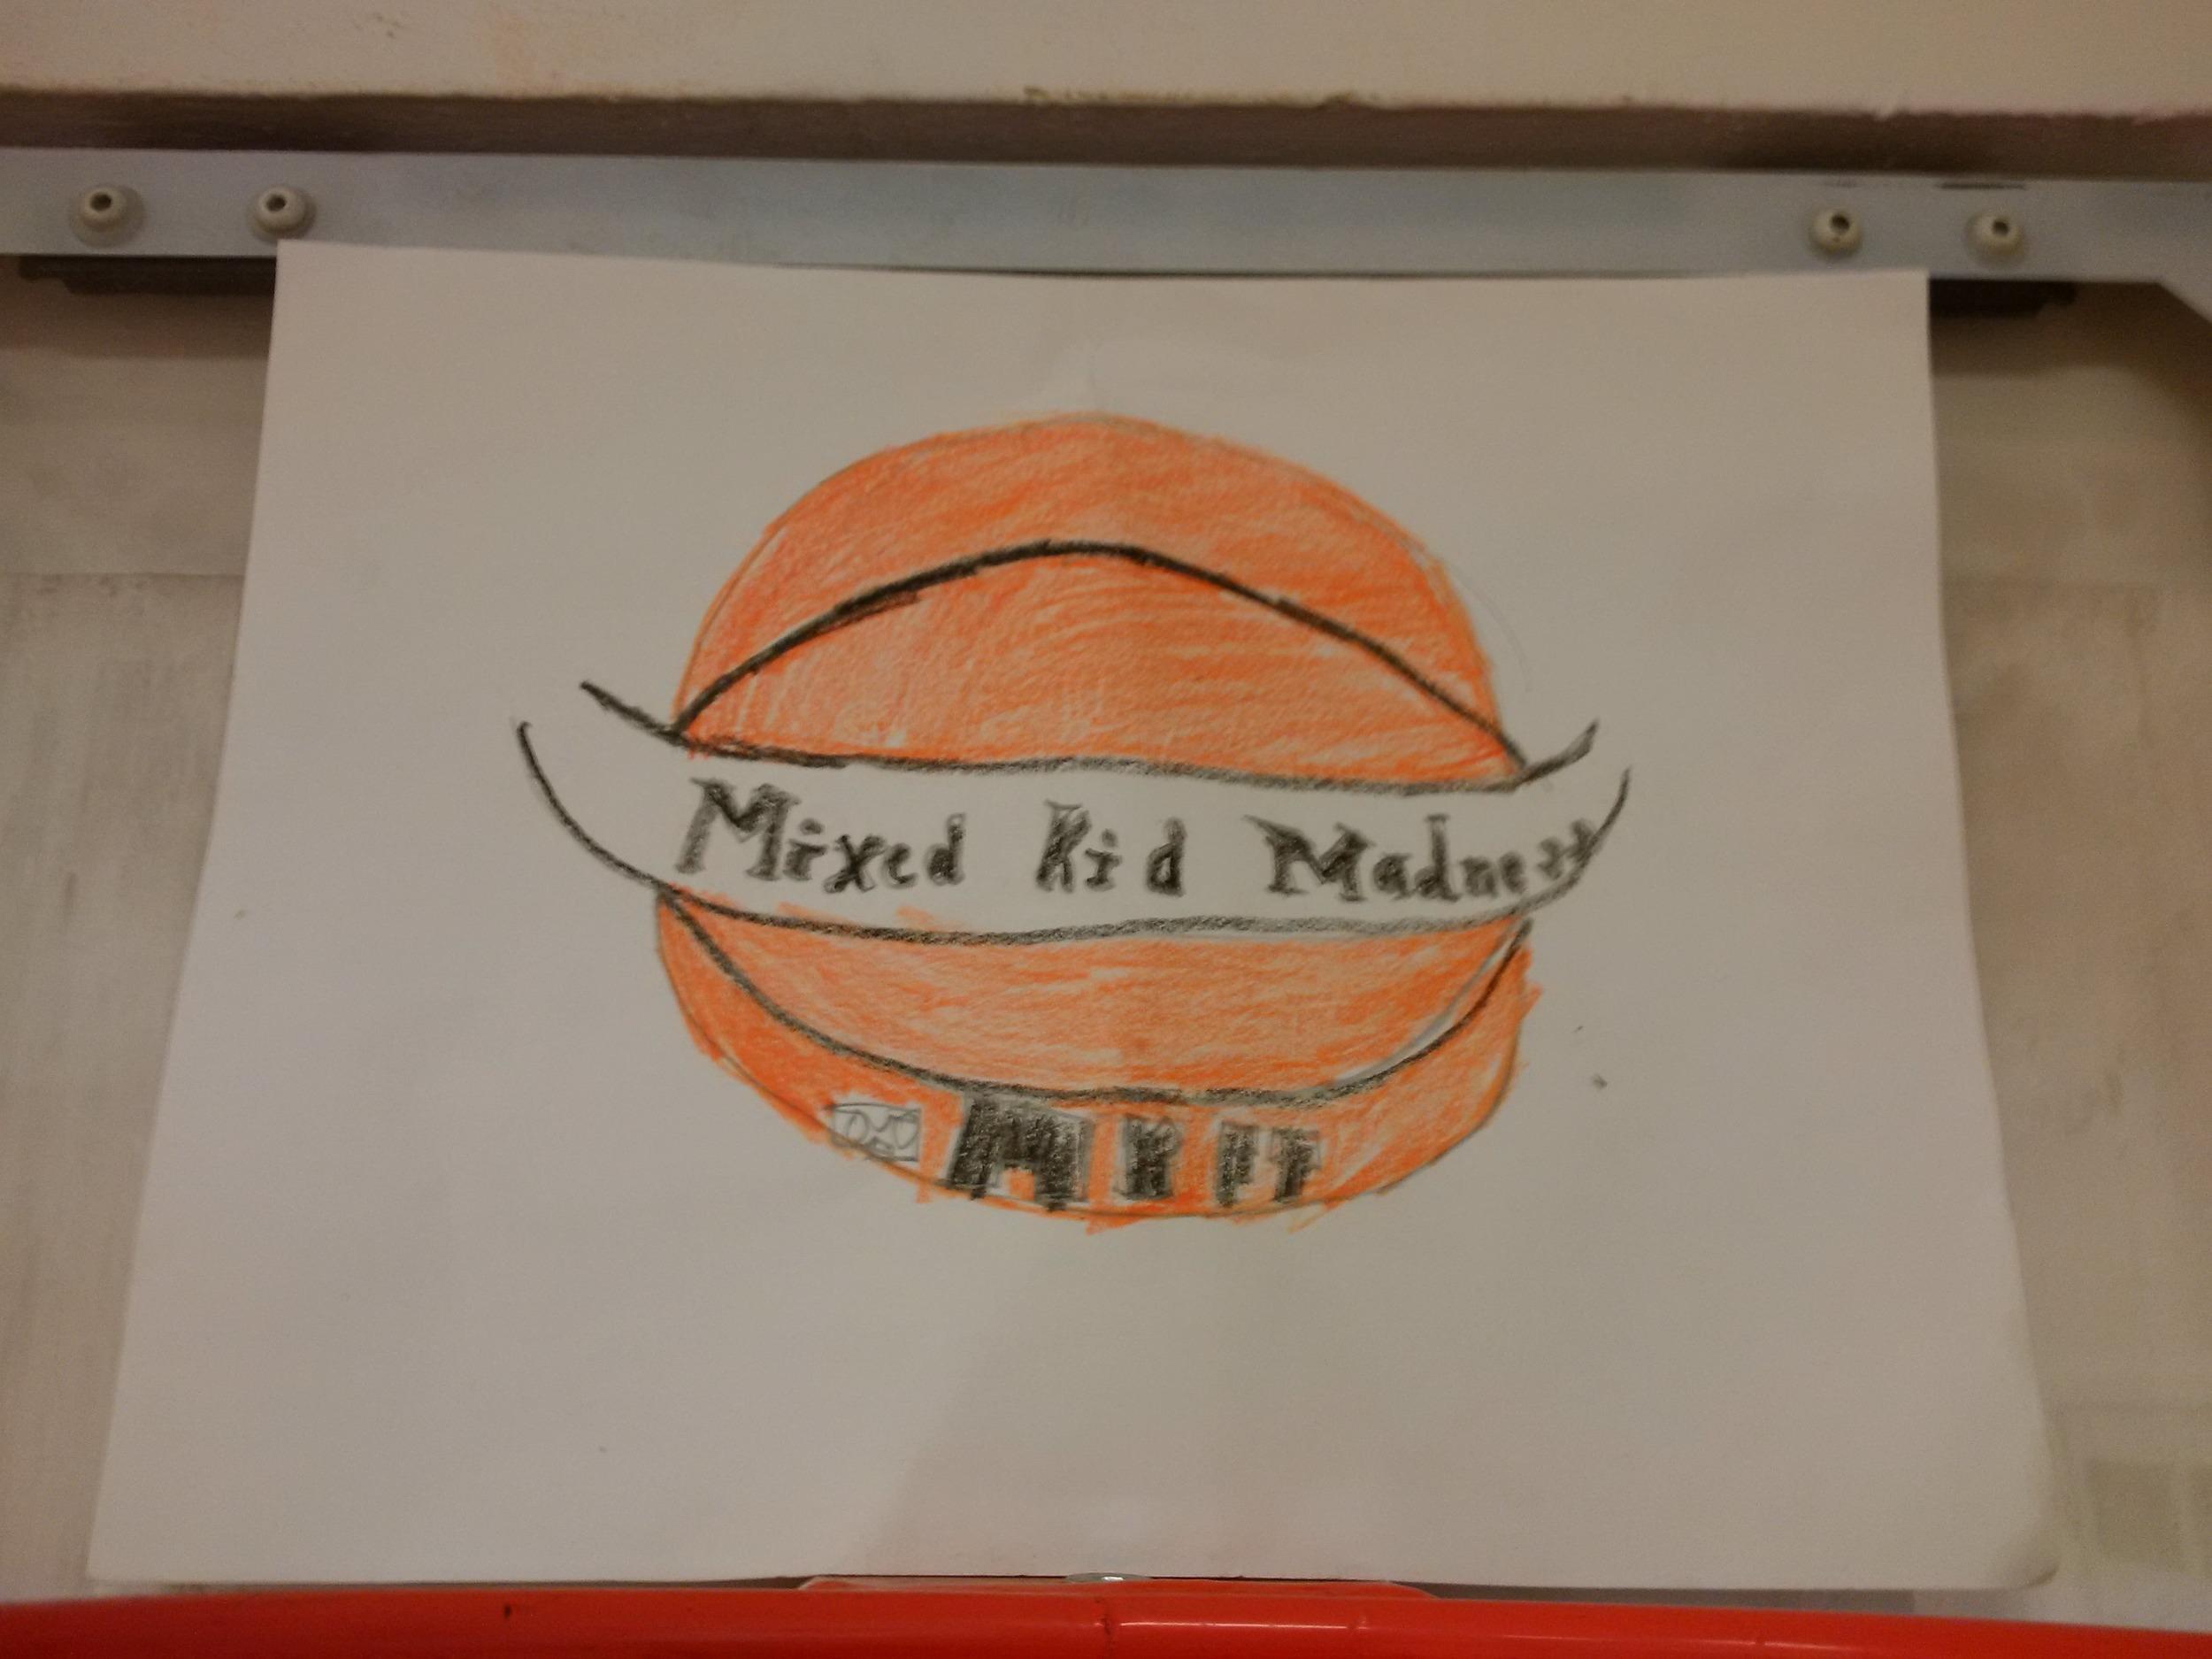 Handmade artwork via Mixed Kid Food Truck.